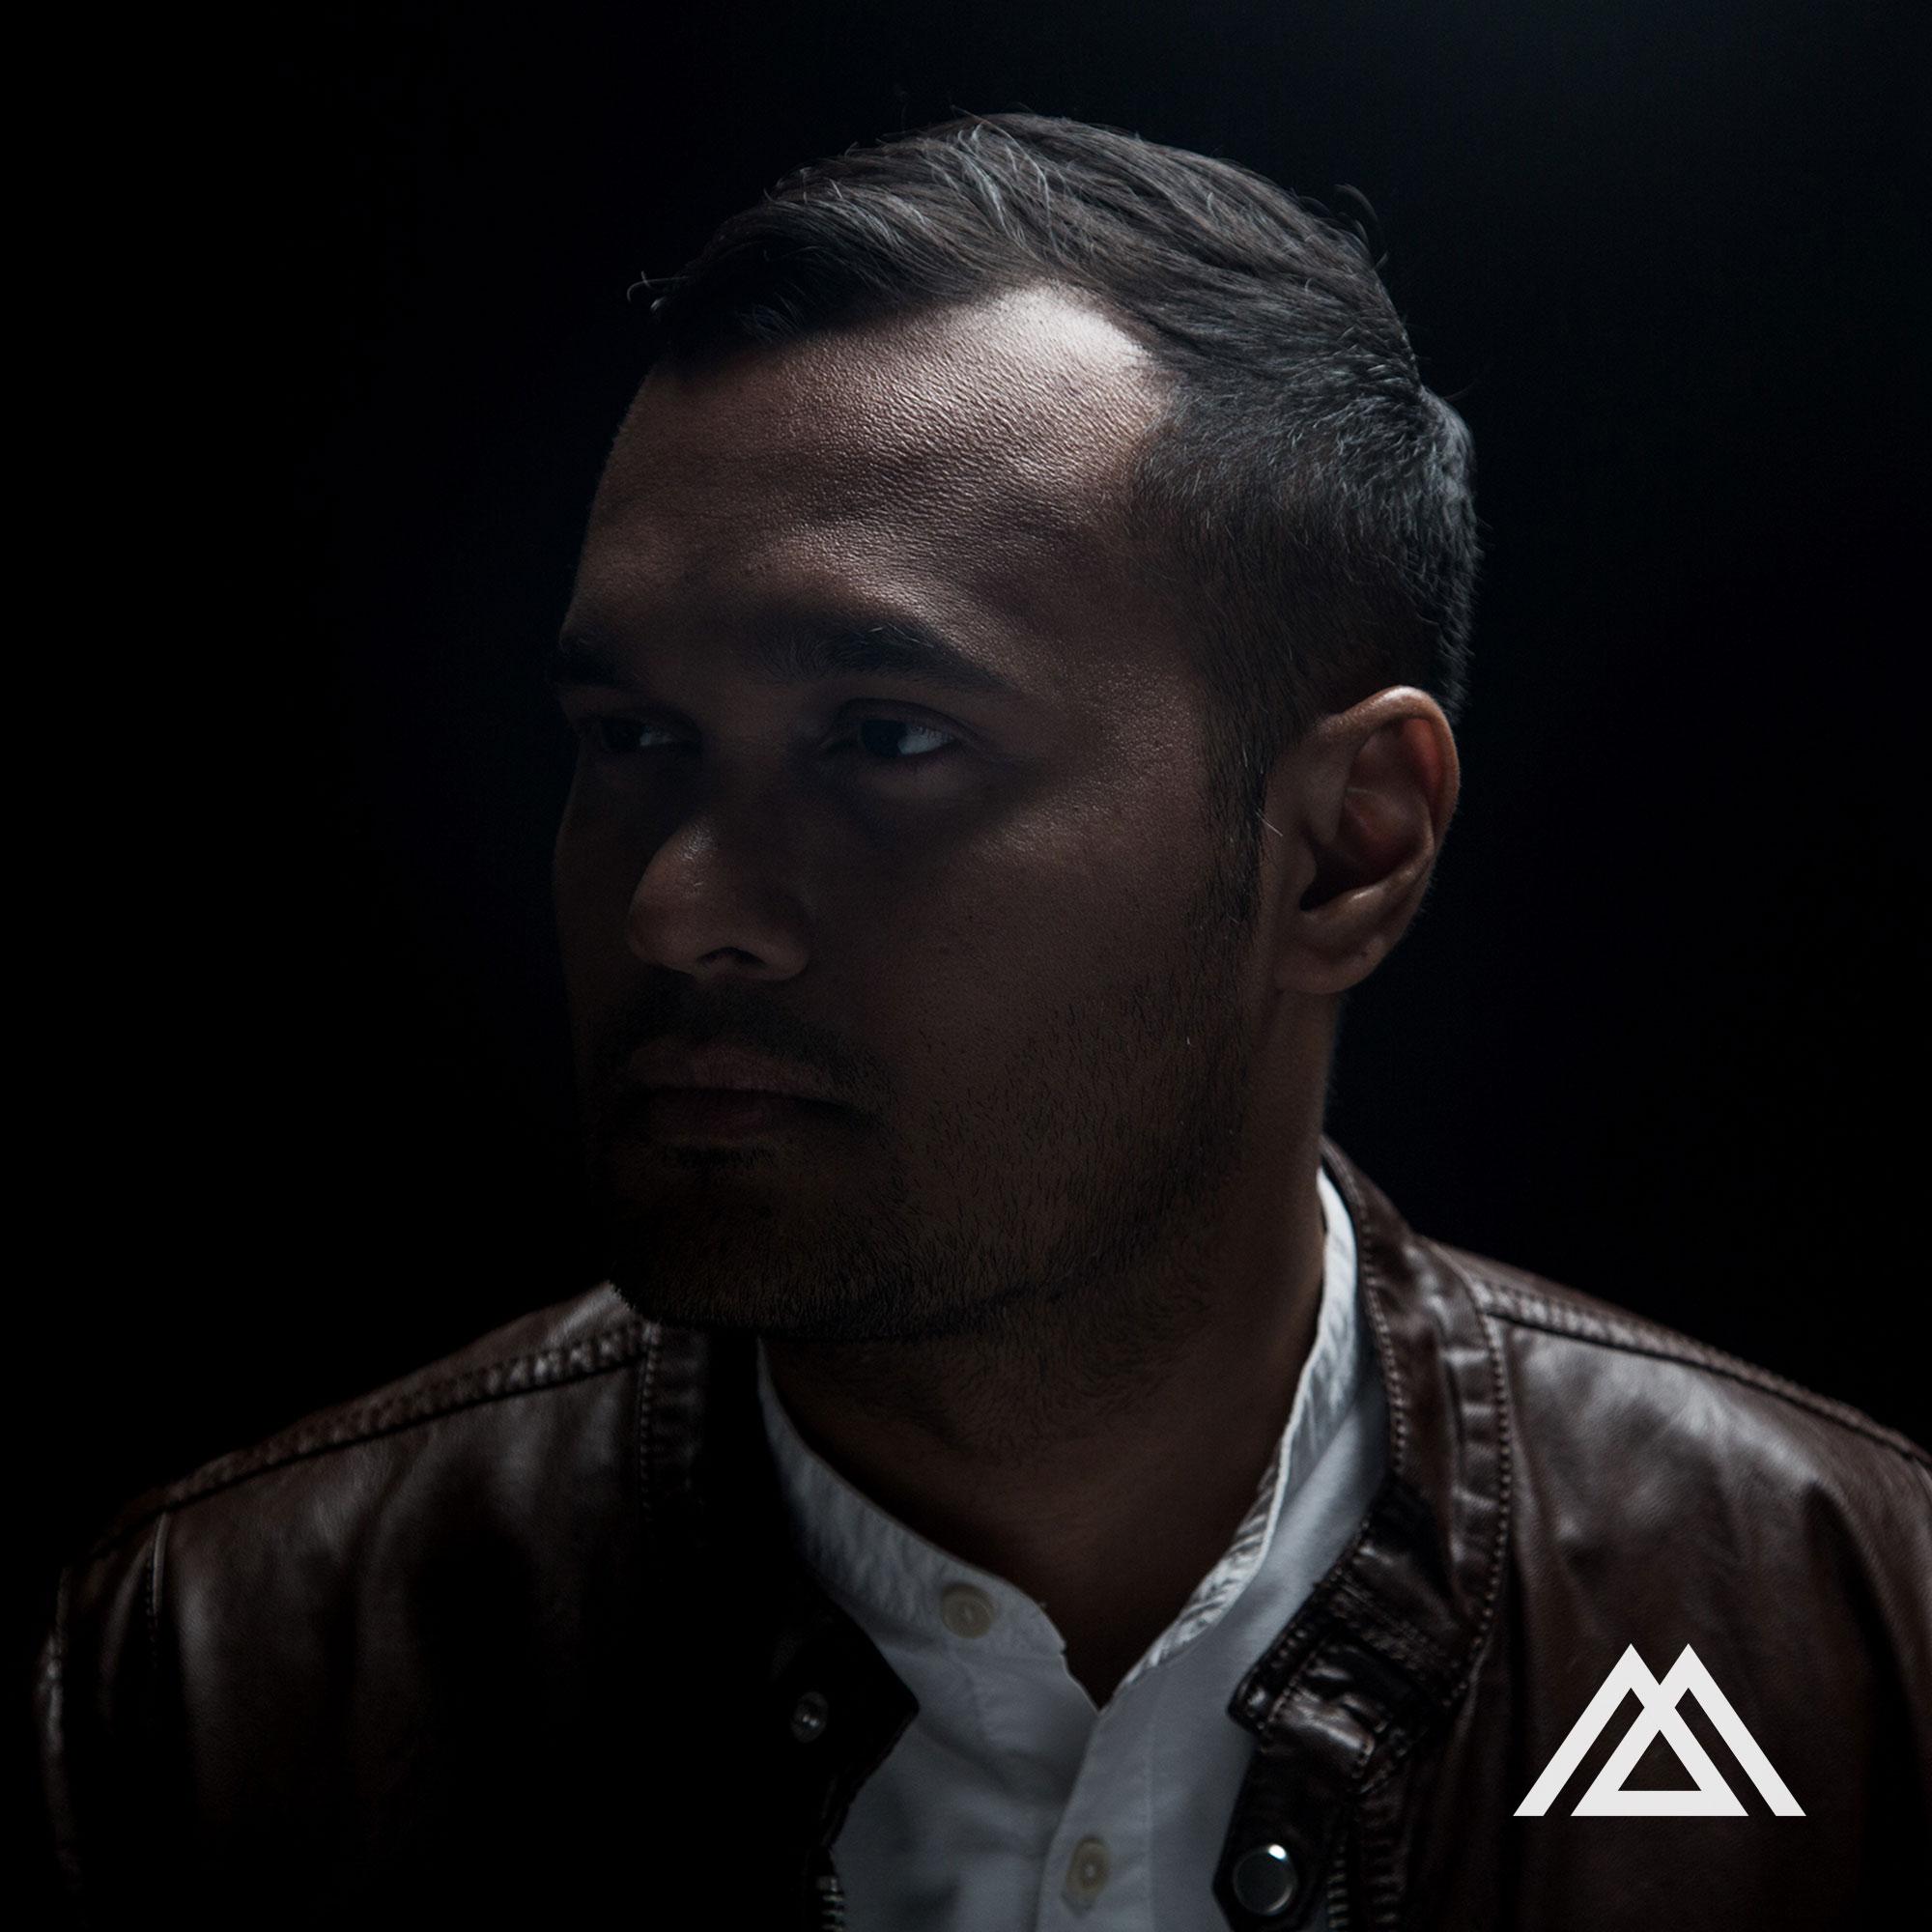 Saiful-2018-LR-Square.jpg